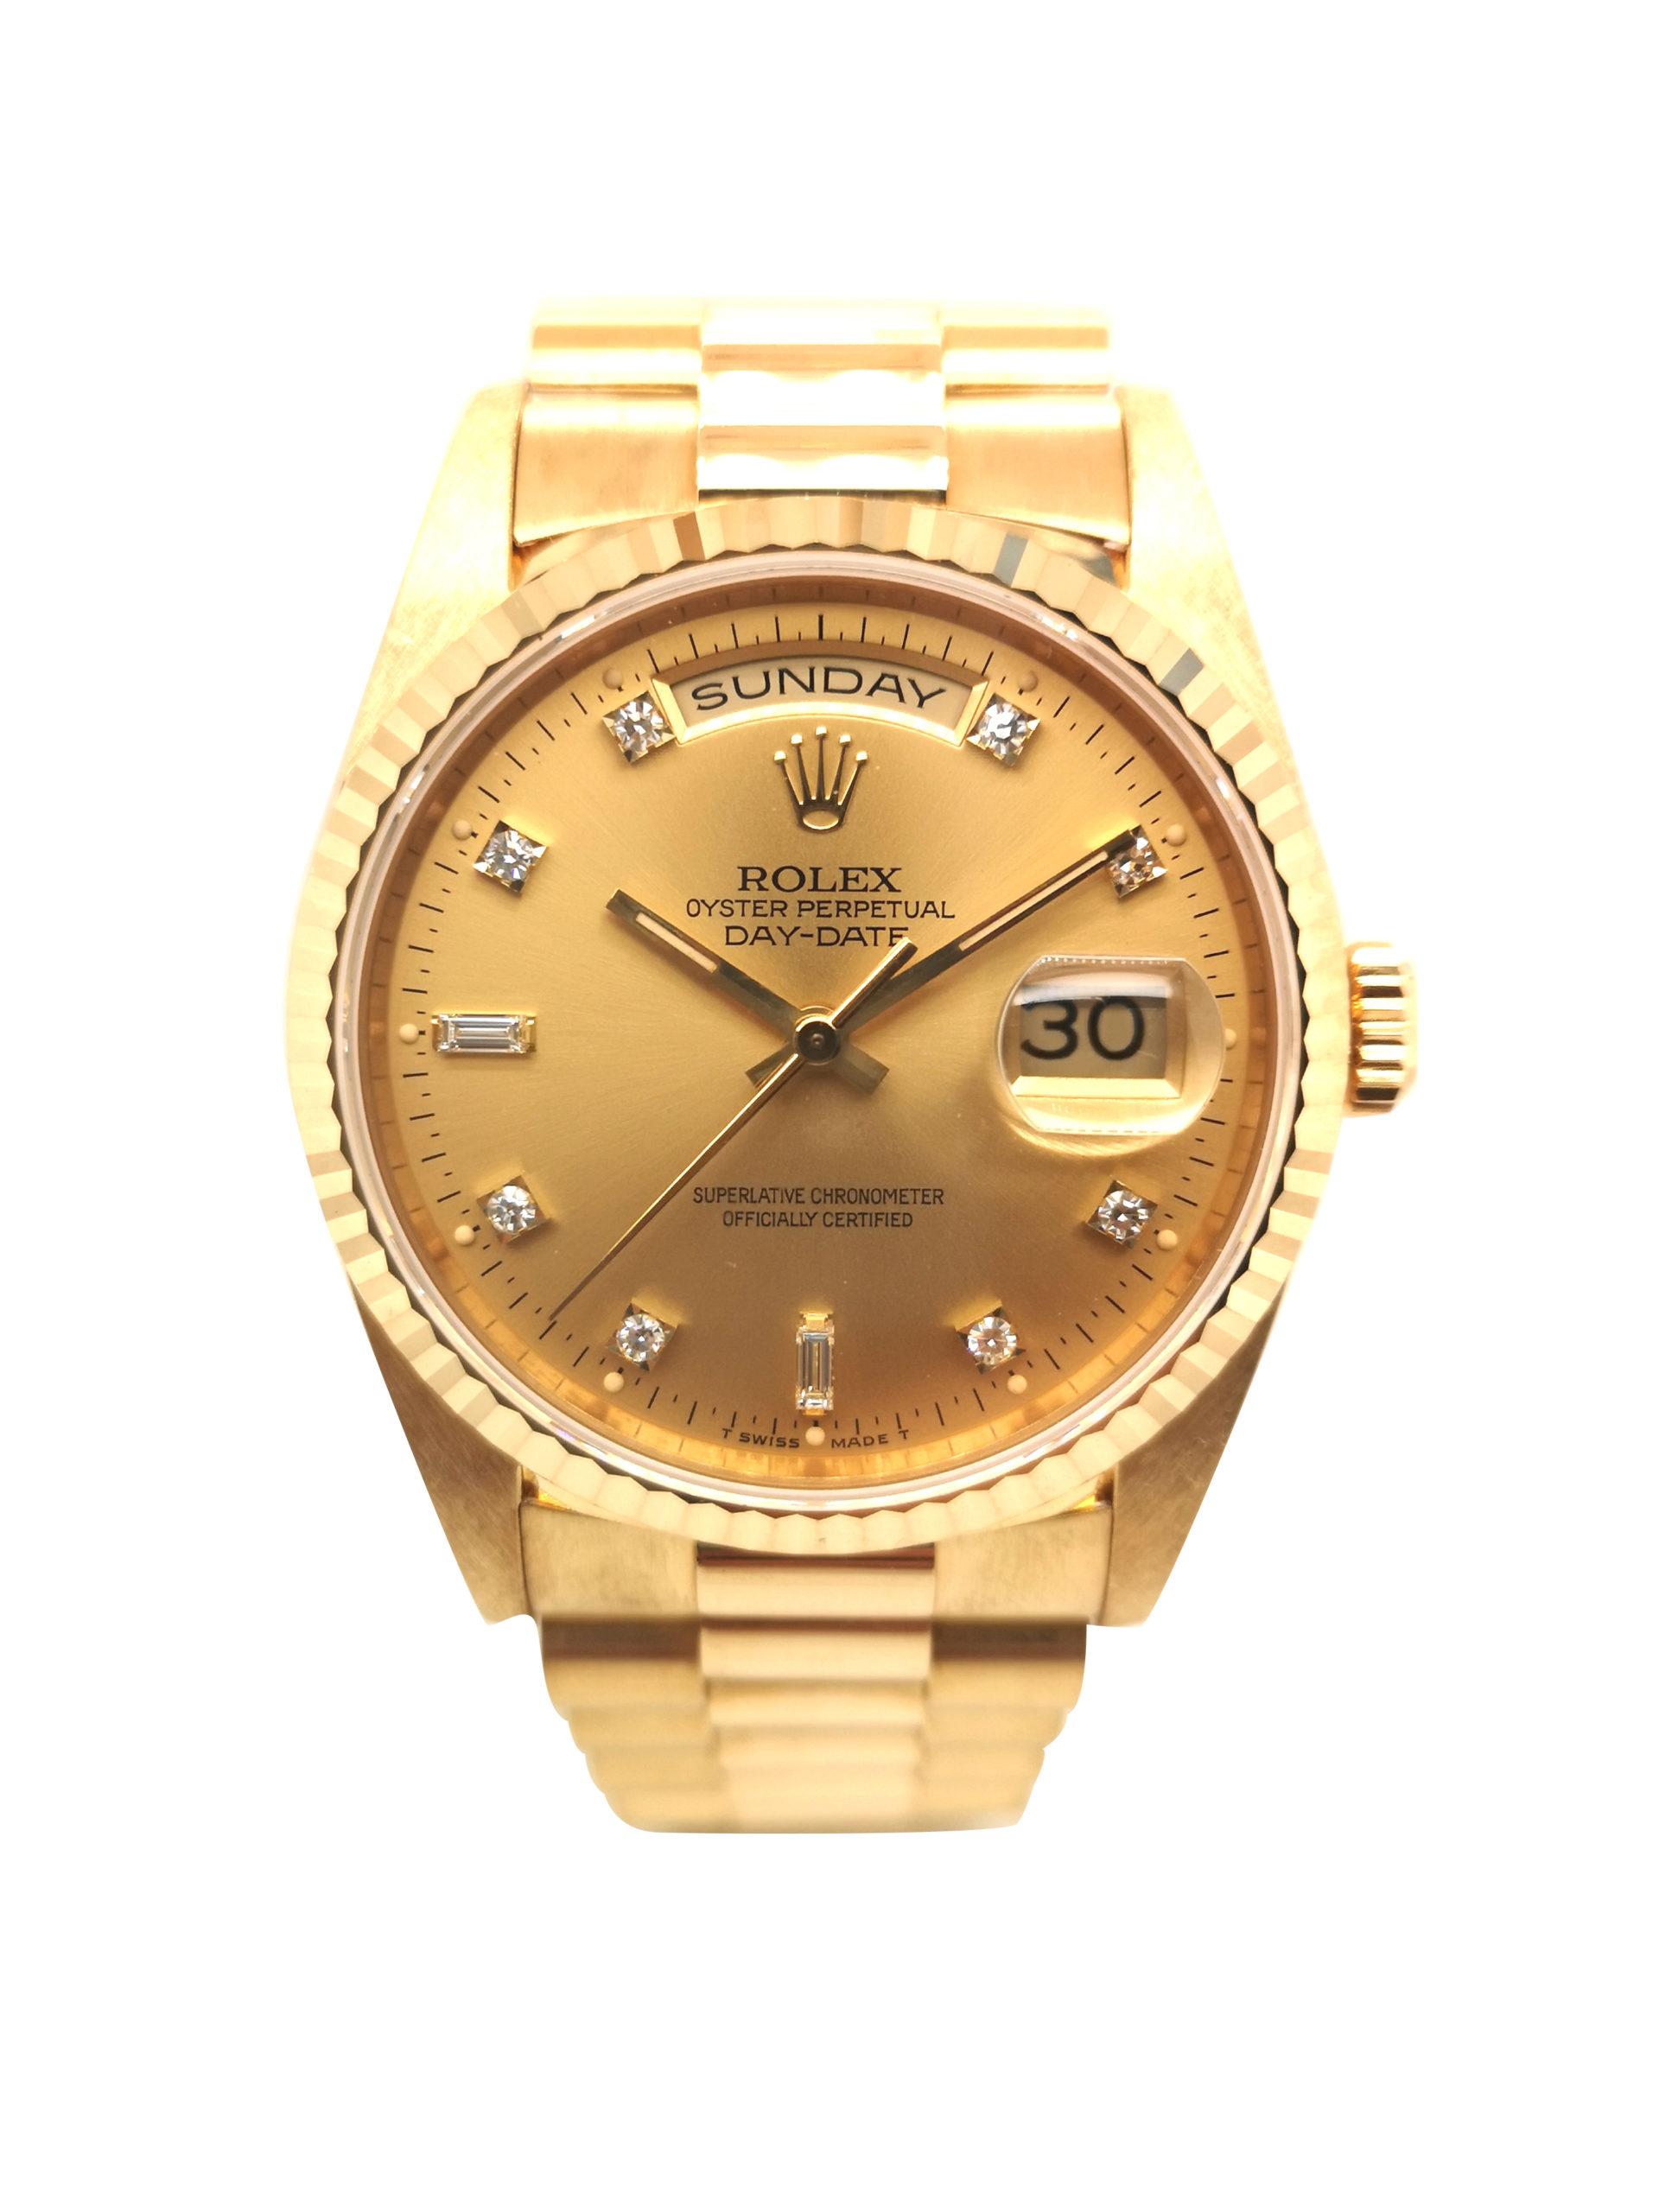 Rolex Day-Date Diamond 18238 Watch